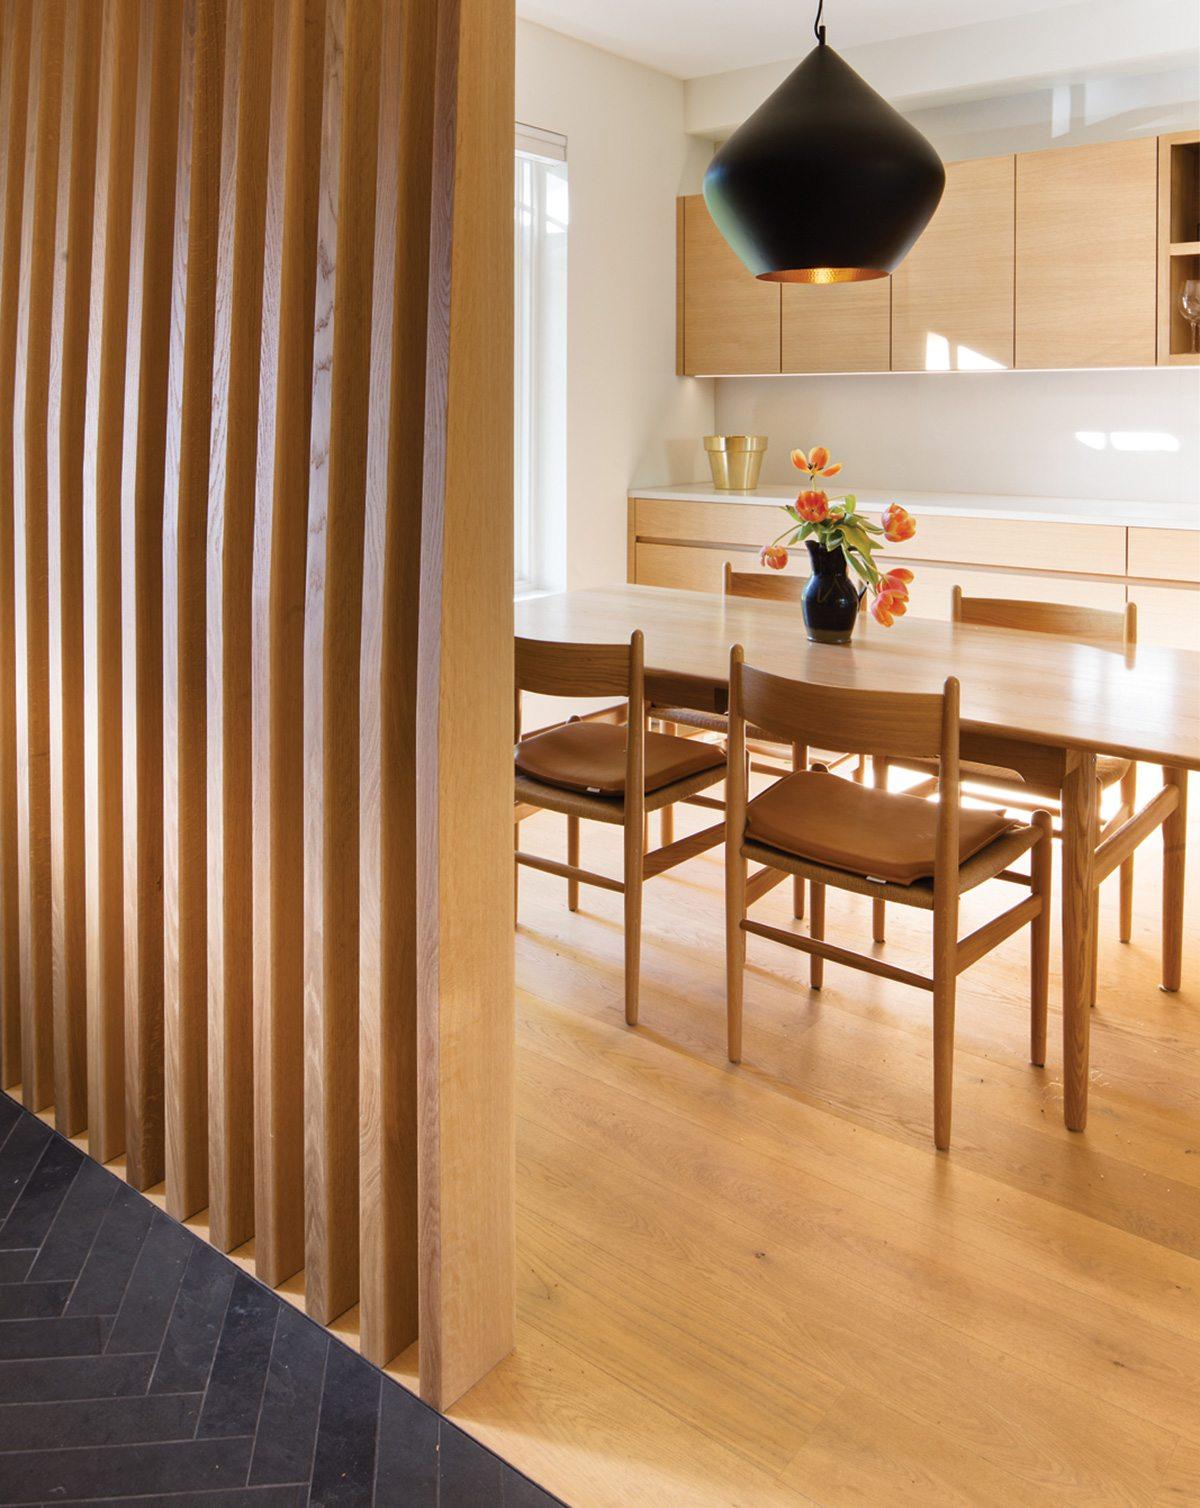 cubitt-greatspaces-kitchen